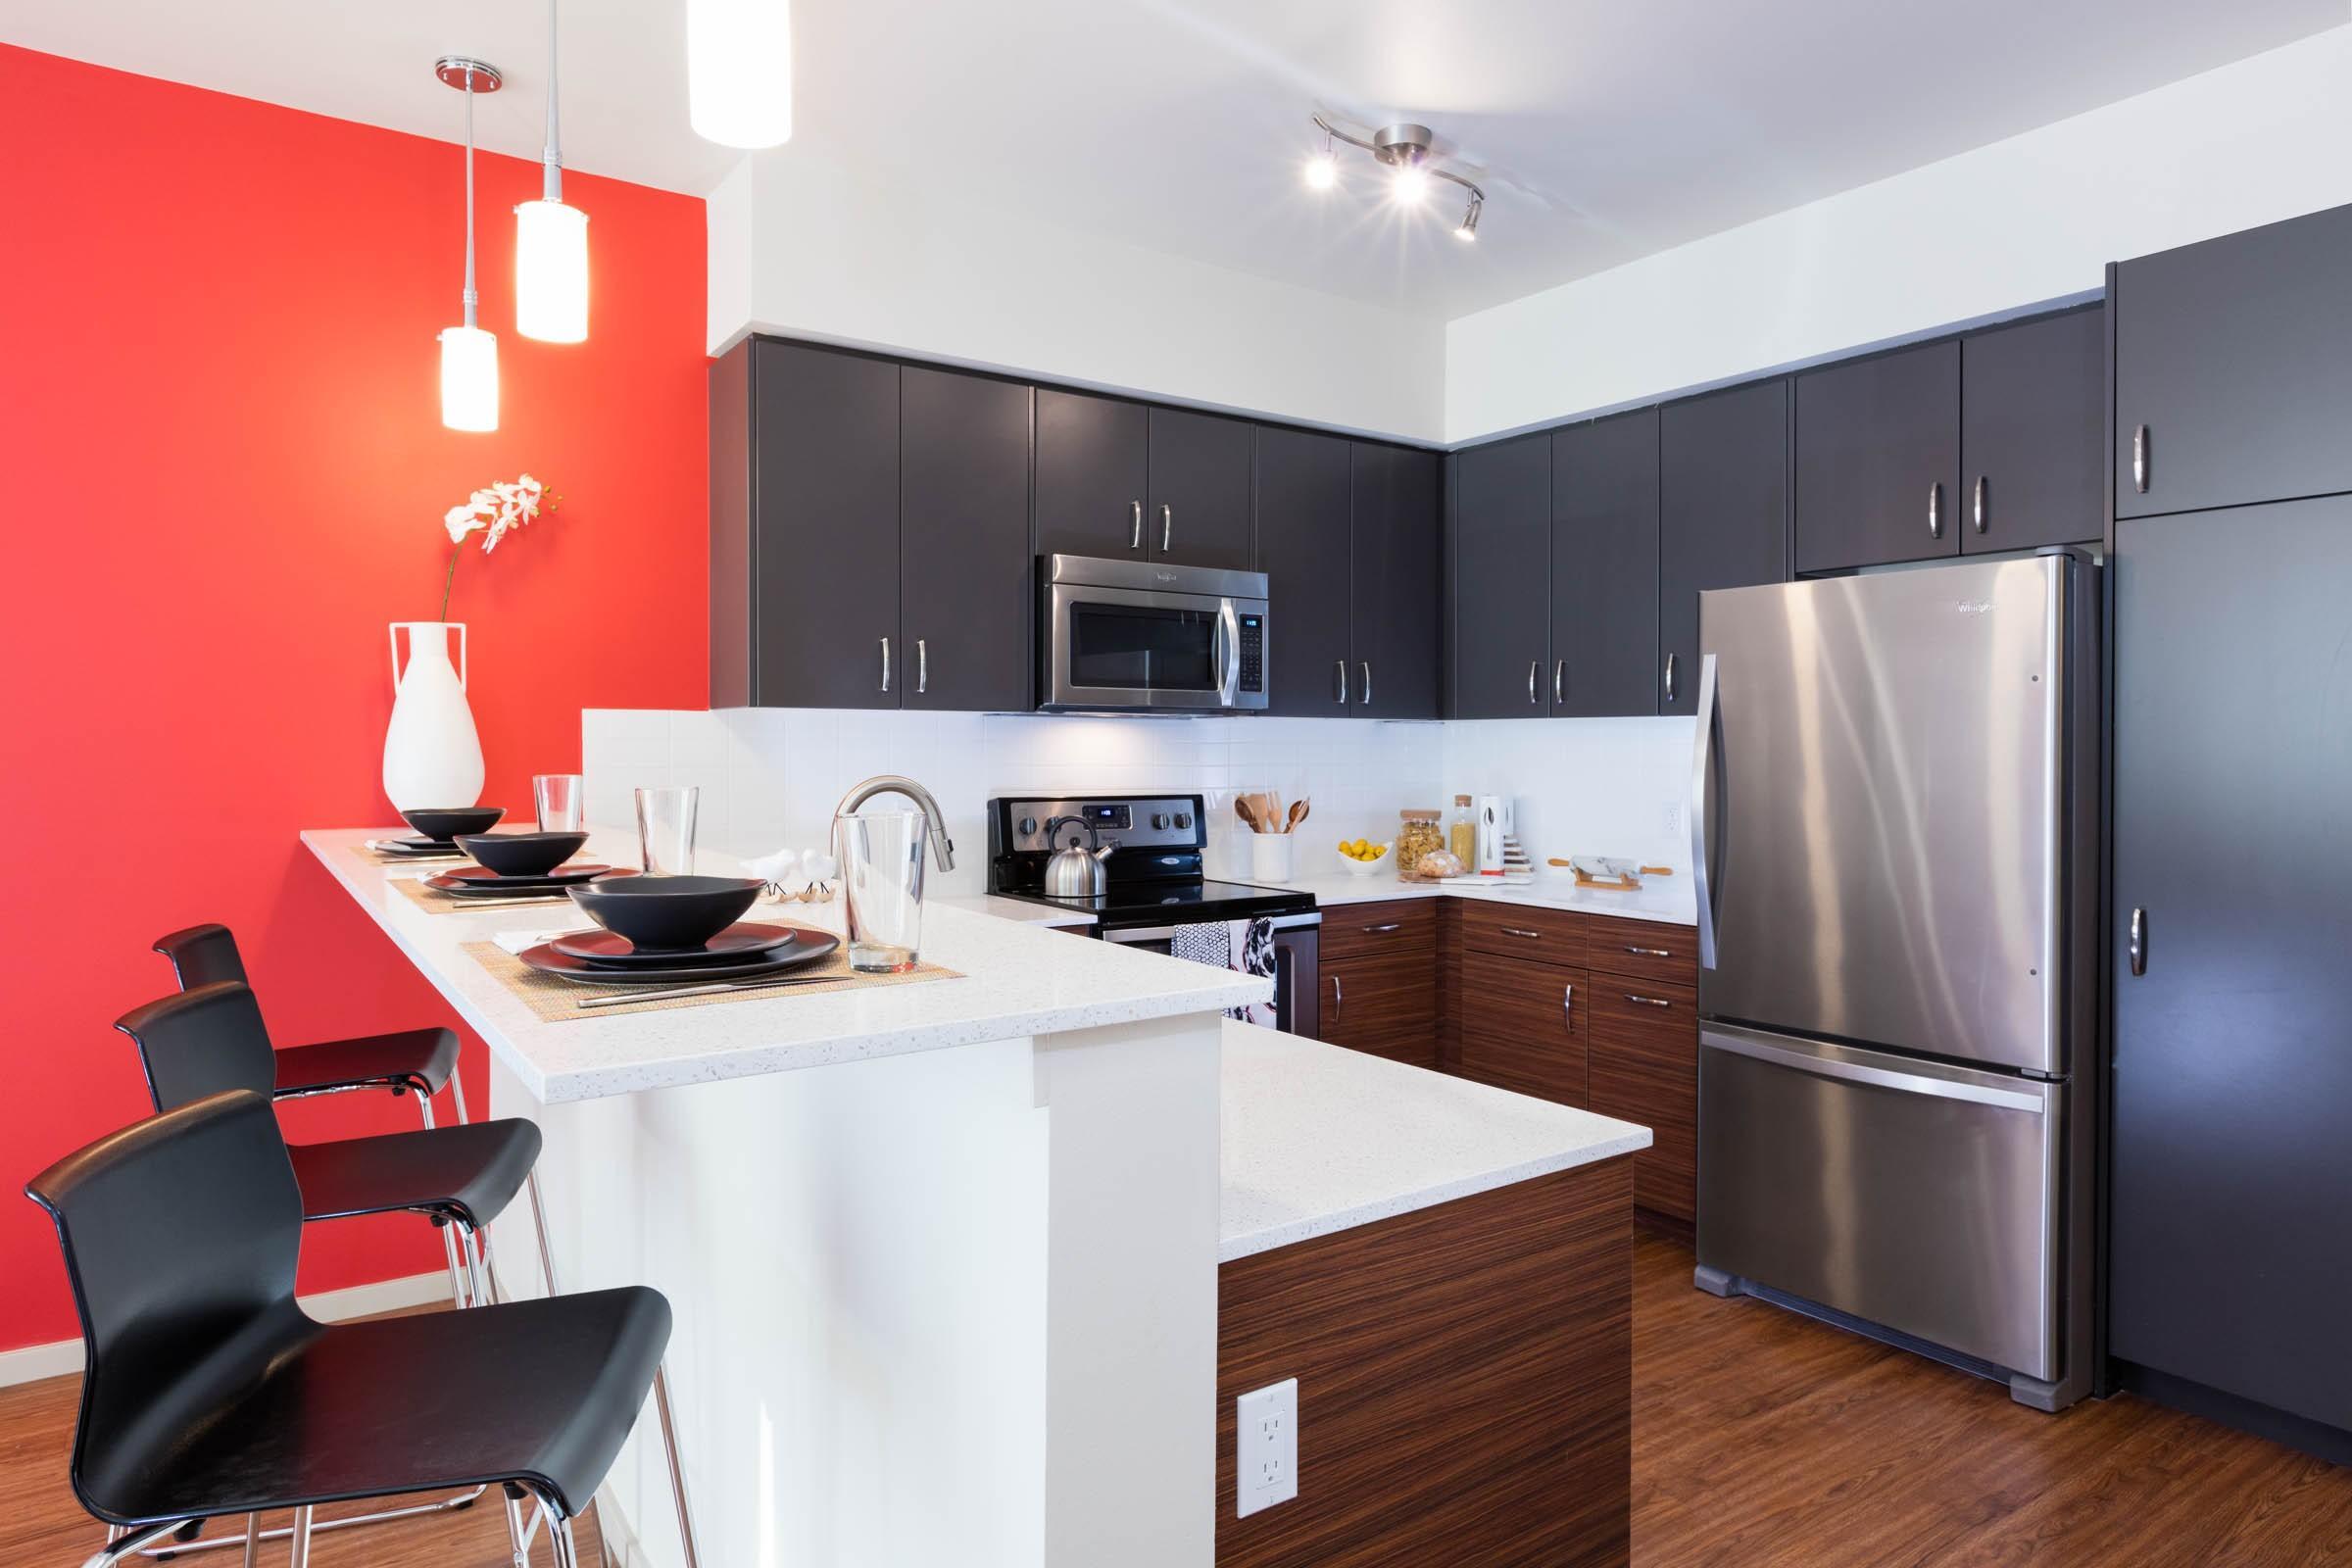 Milehouse Apartments photo #1